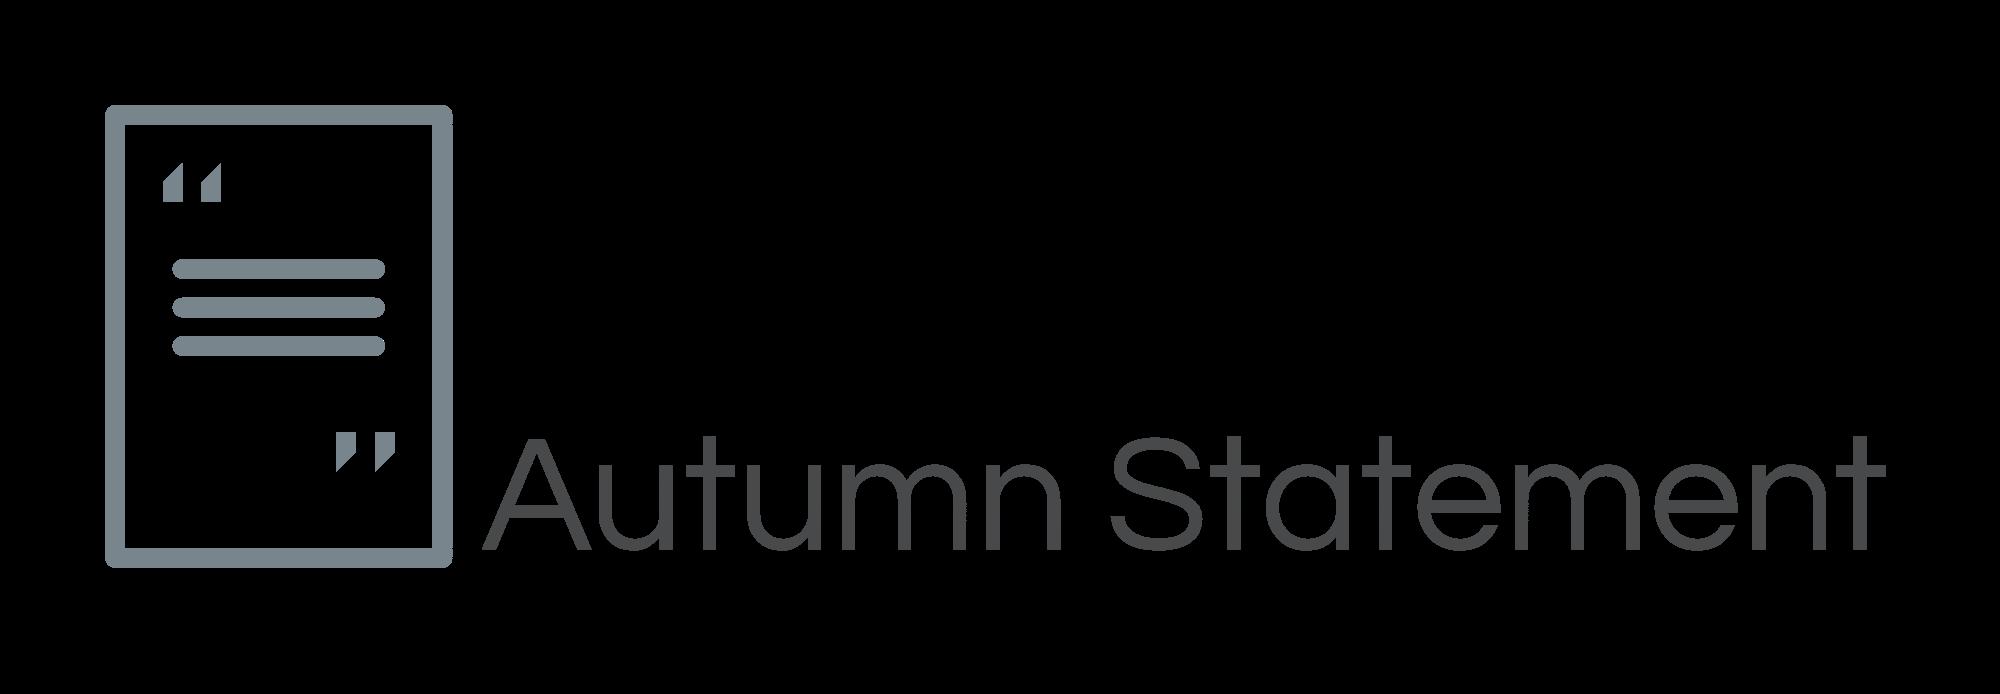 Autumn Statement-logo(3).png